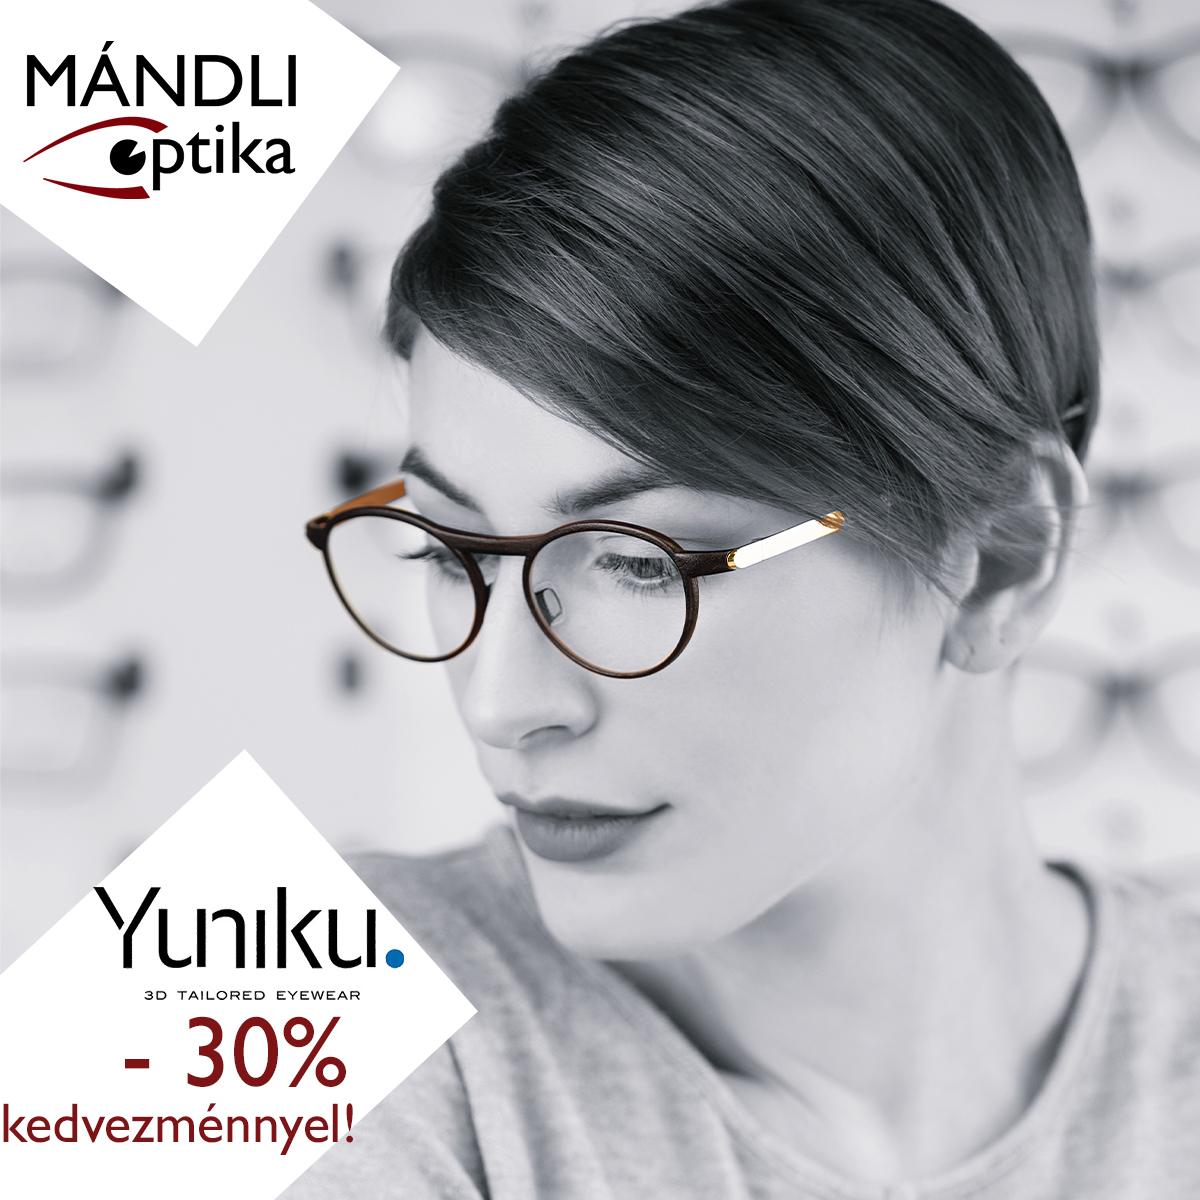 Mandli_optika_Szombathely_Yuniku_akcio_Hoya_3d